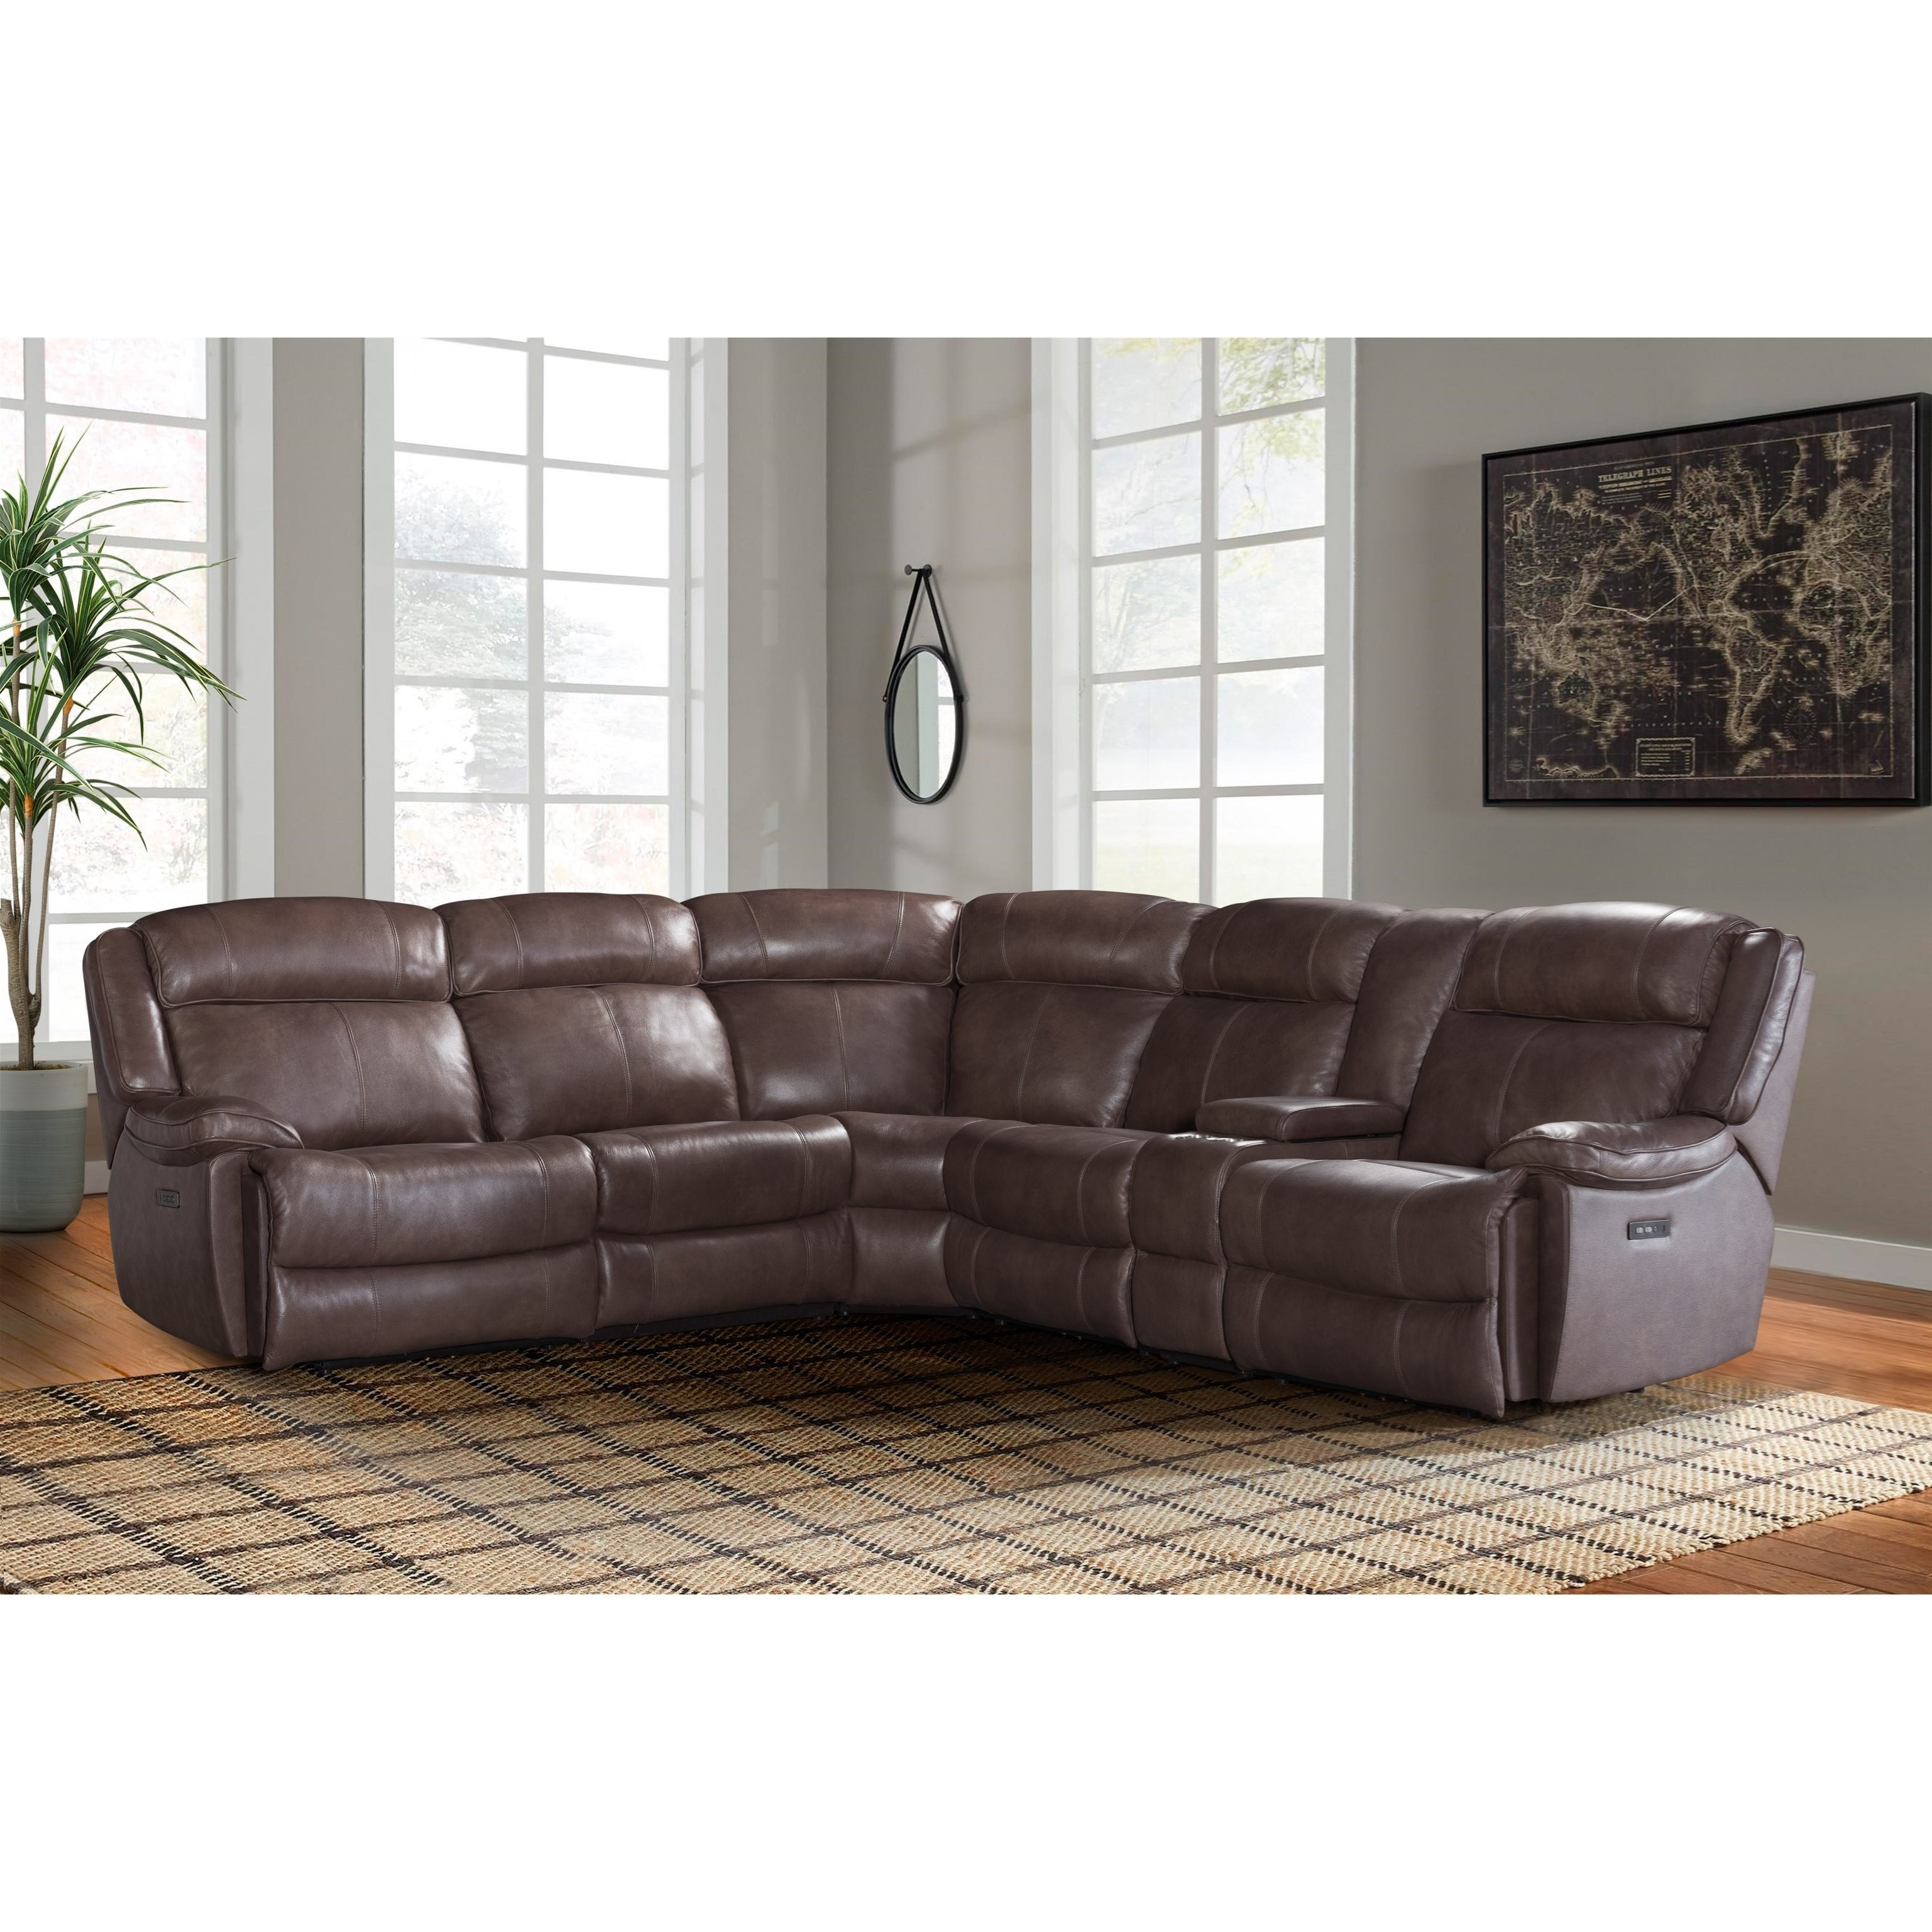 avalon dual power reclining sectional sofa